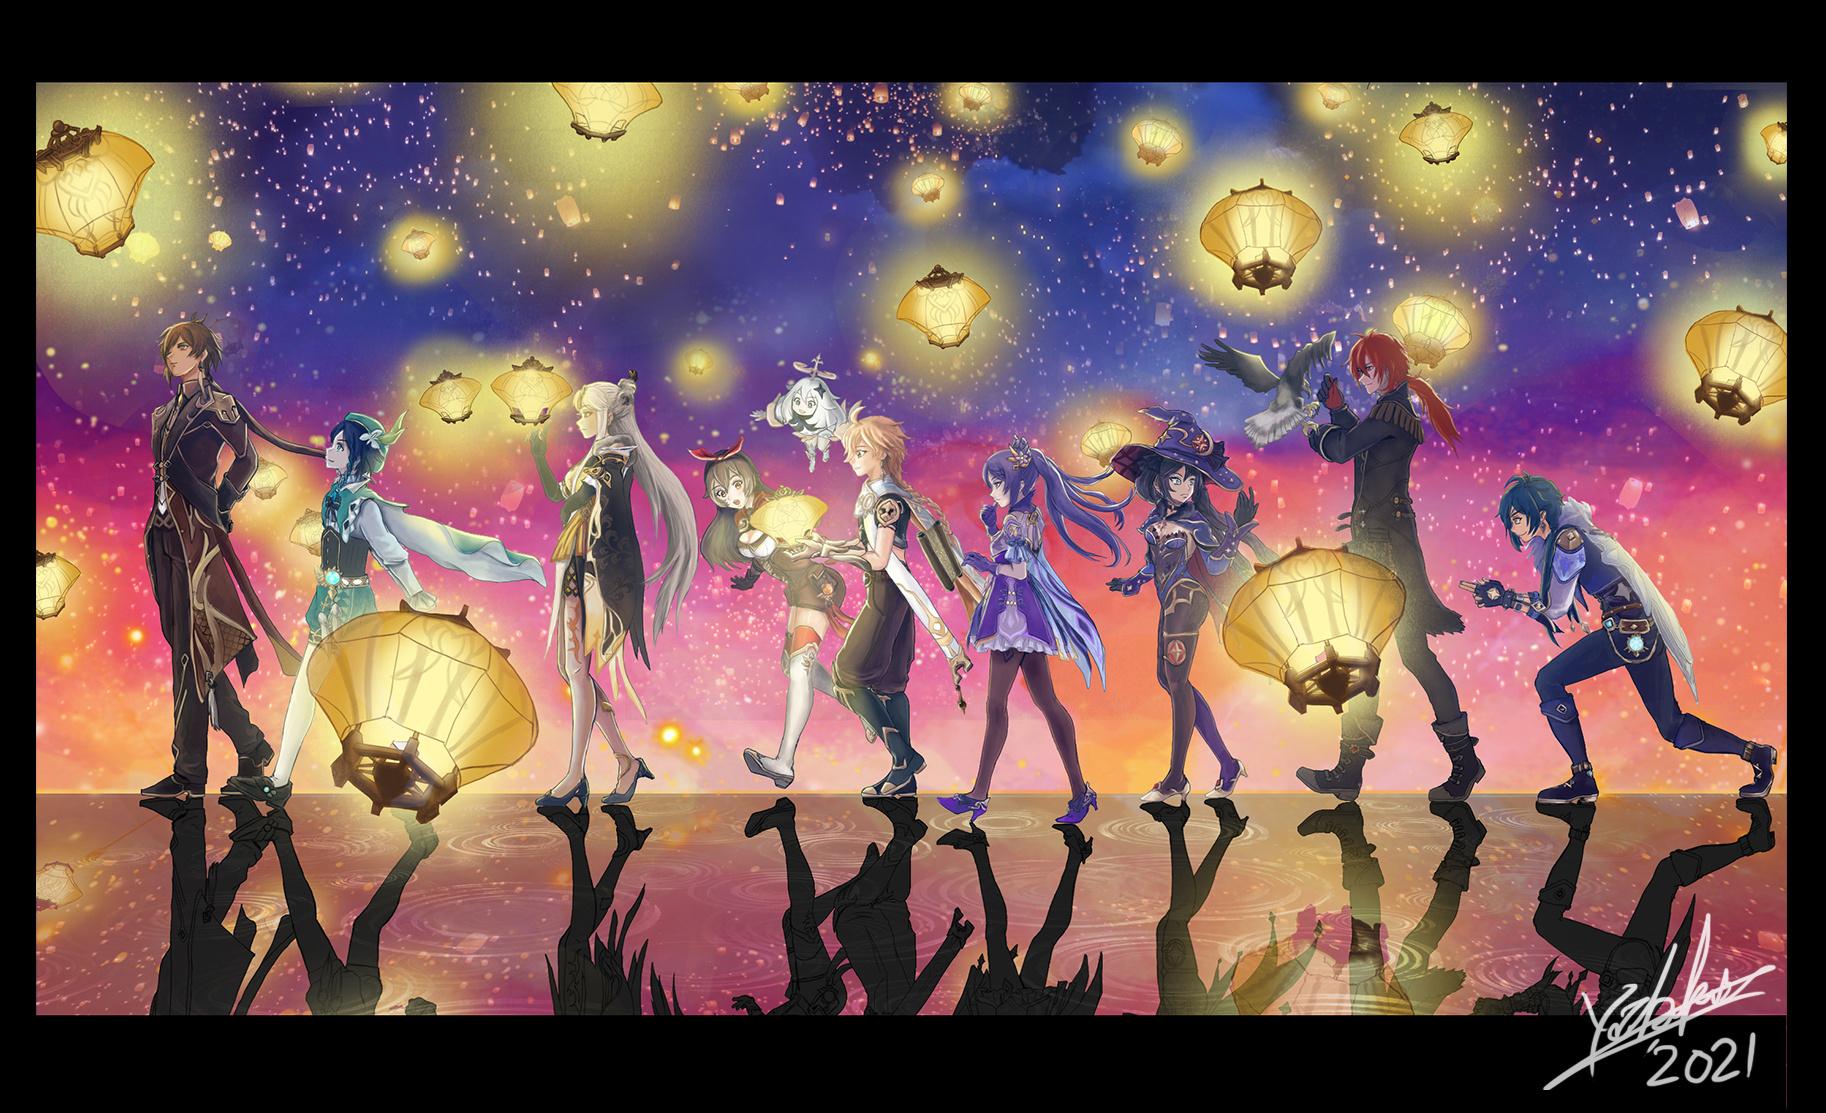 Anime 1826x1113 Genshin Impact Aether(genshin impact) Paimon(Genshin Impact) Zhongli (Genshin Impact) keqing (genshin impact) Ningguang (Genshin Impact) Venti (Genshin Impact) Amber (Genshin Impact) Mona (Genshin Impact) Diluc (Genshin Impact) Kaeya (Genshin Impact)